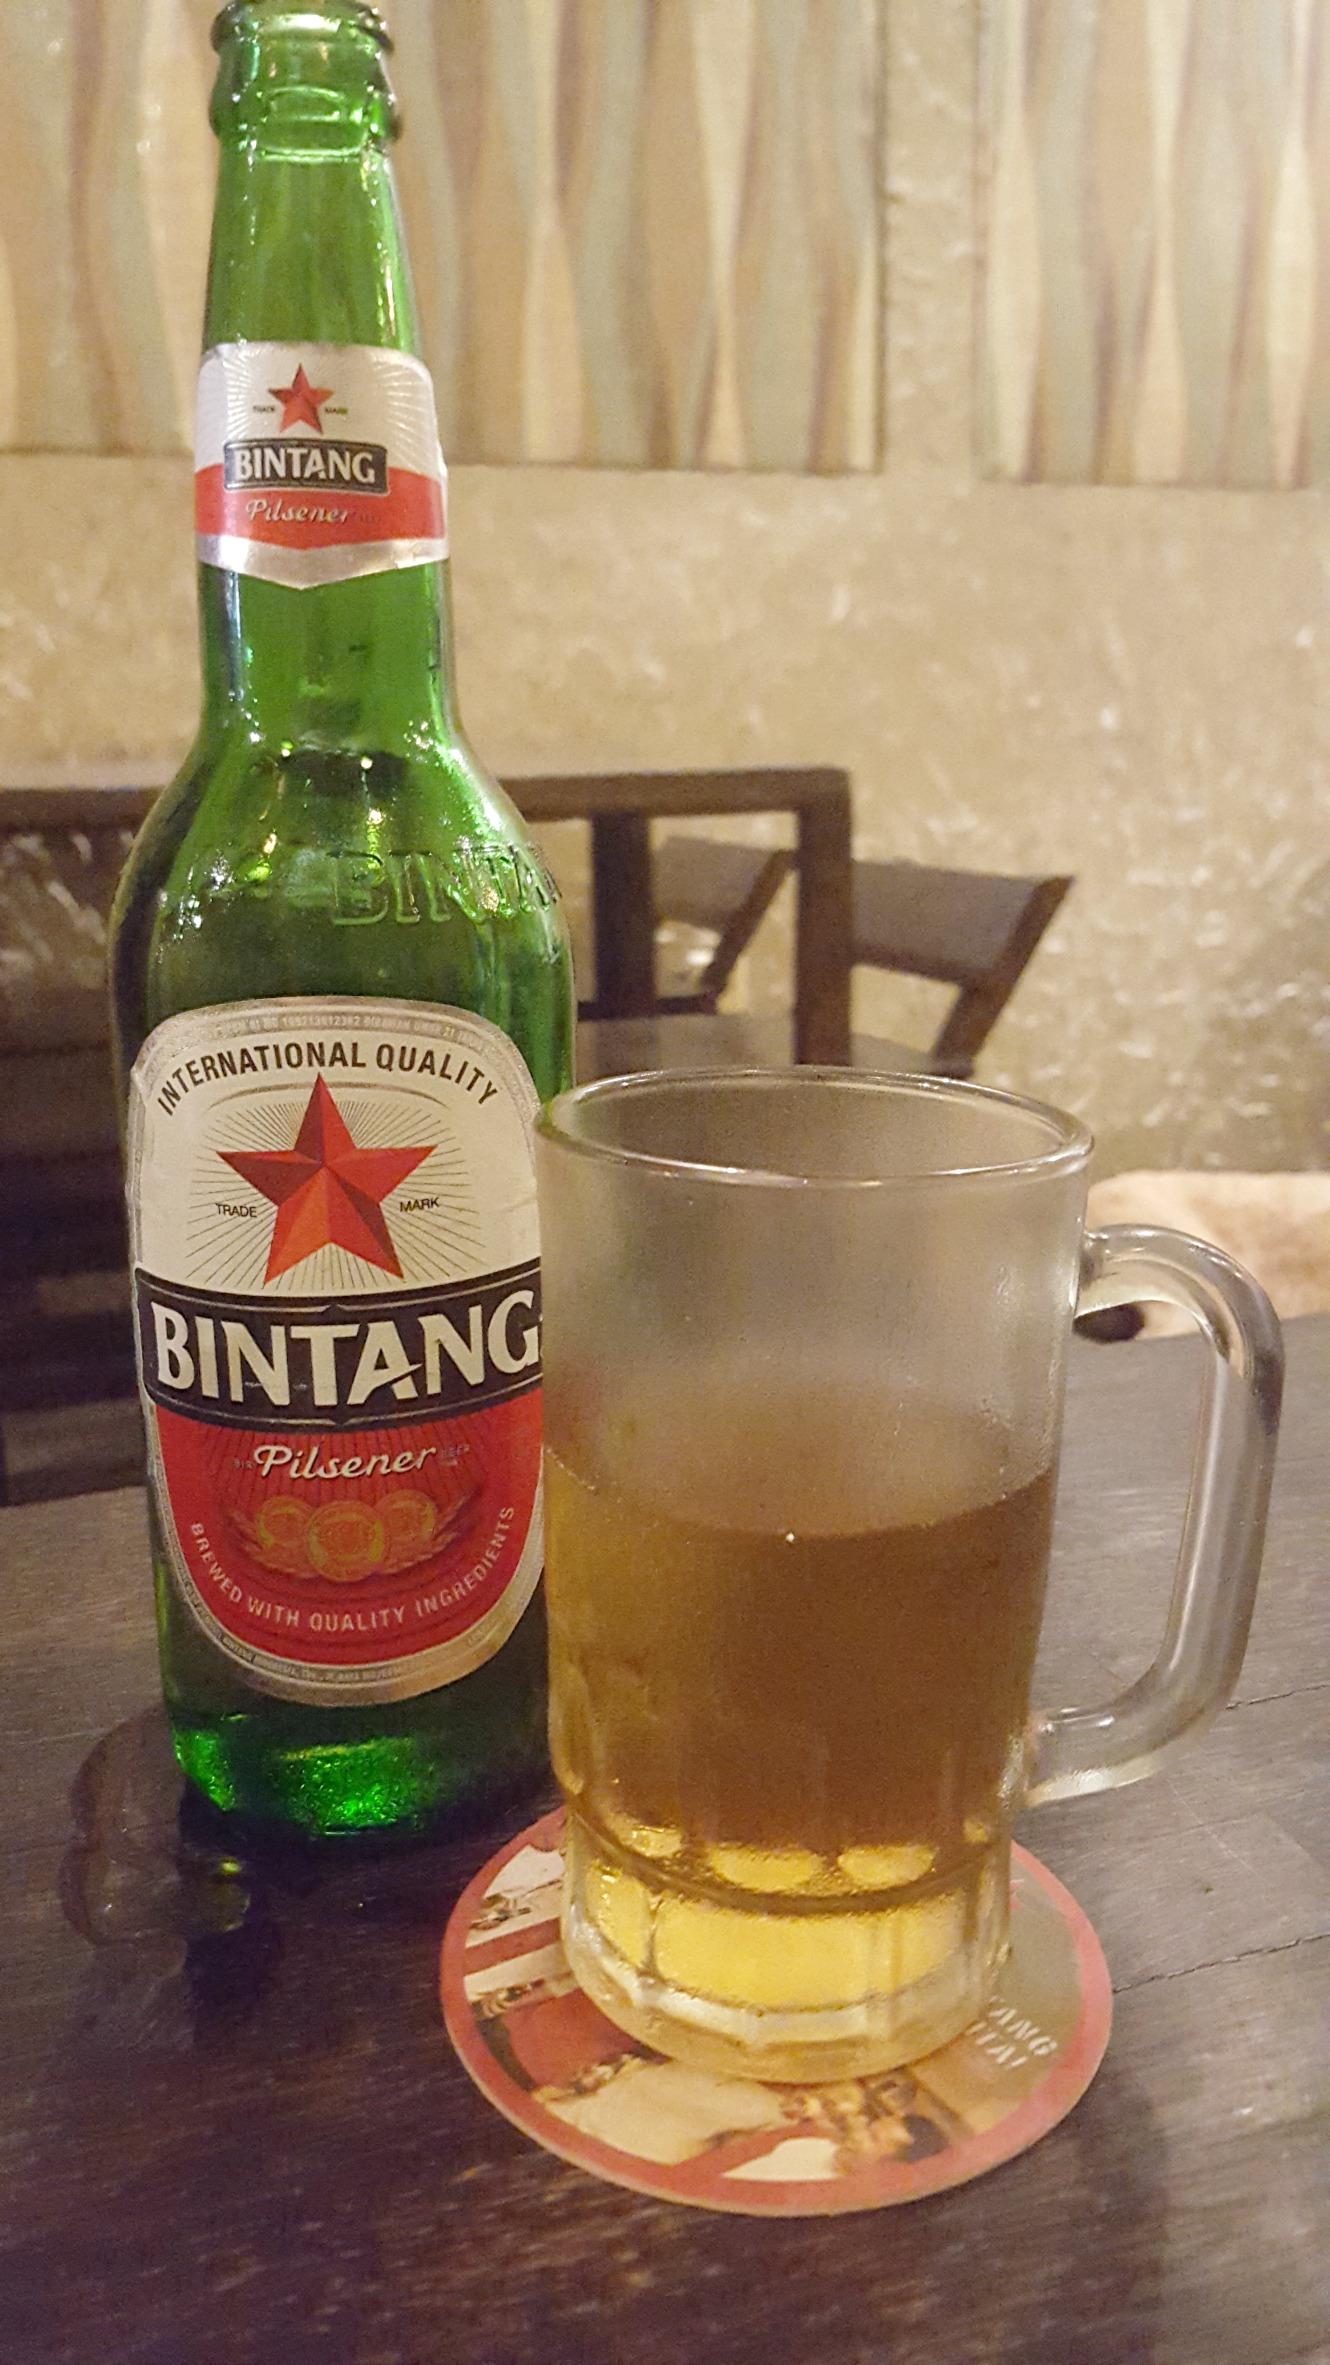 Bintang = Beer